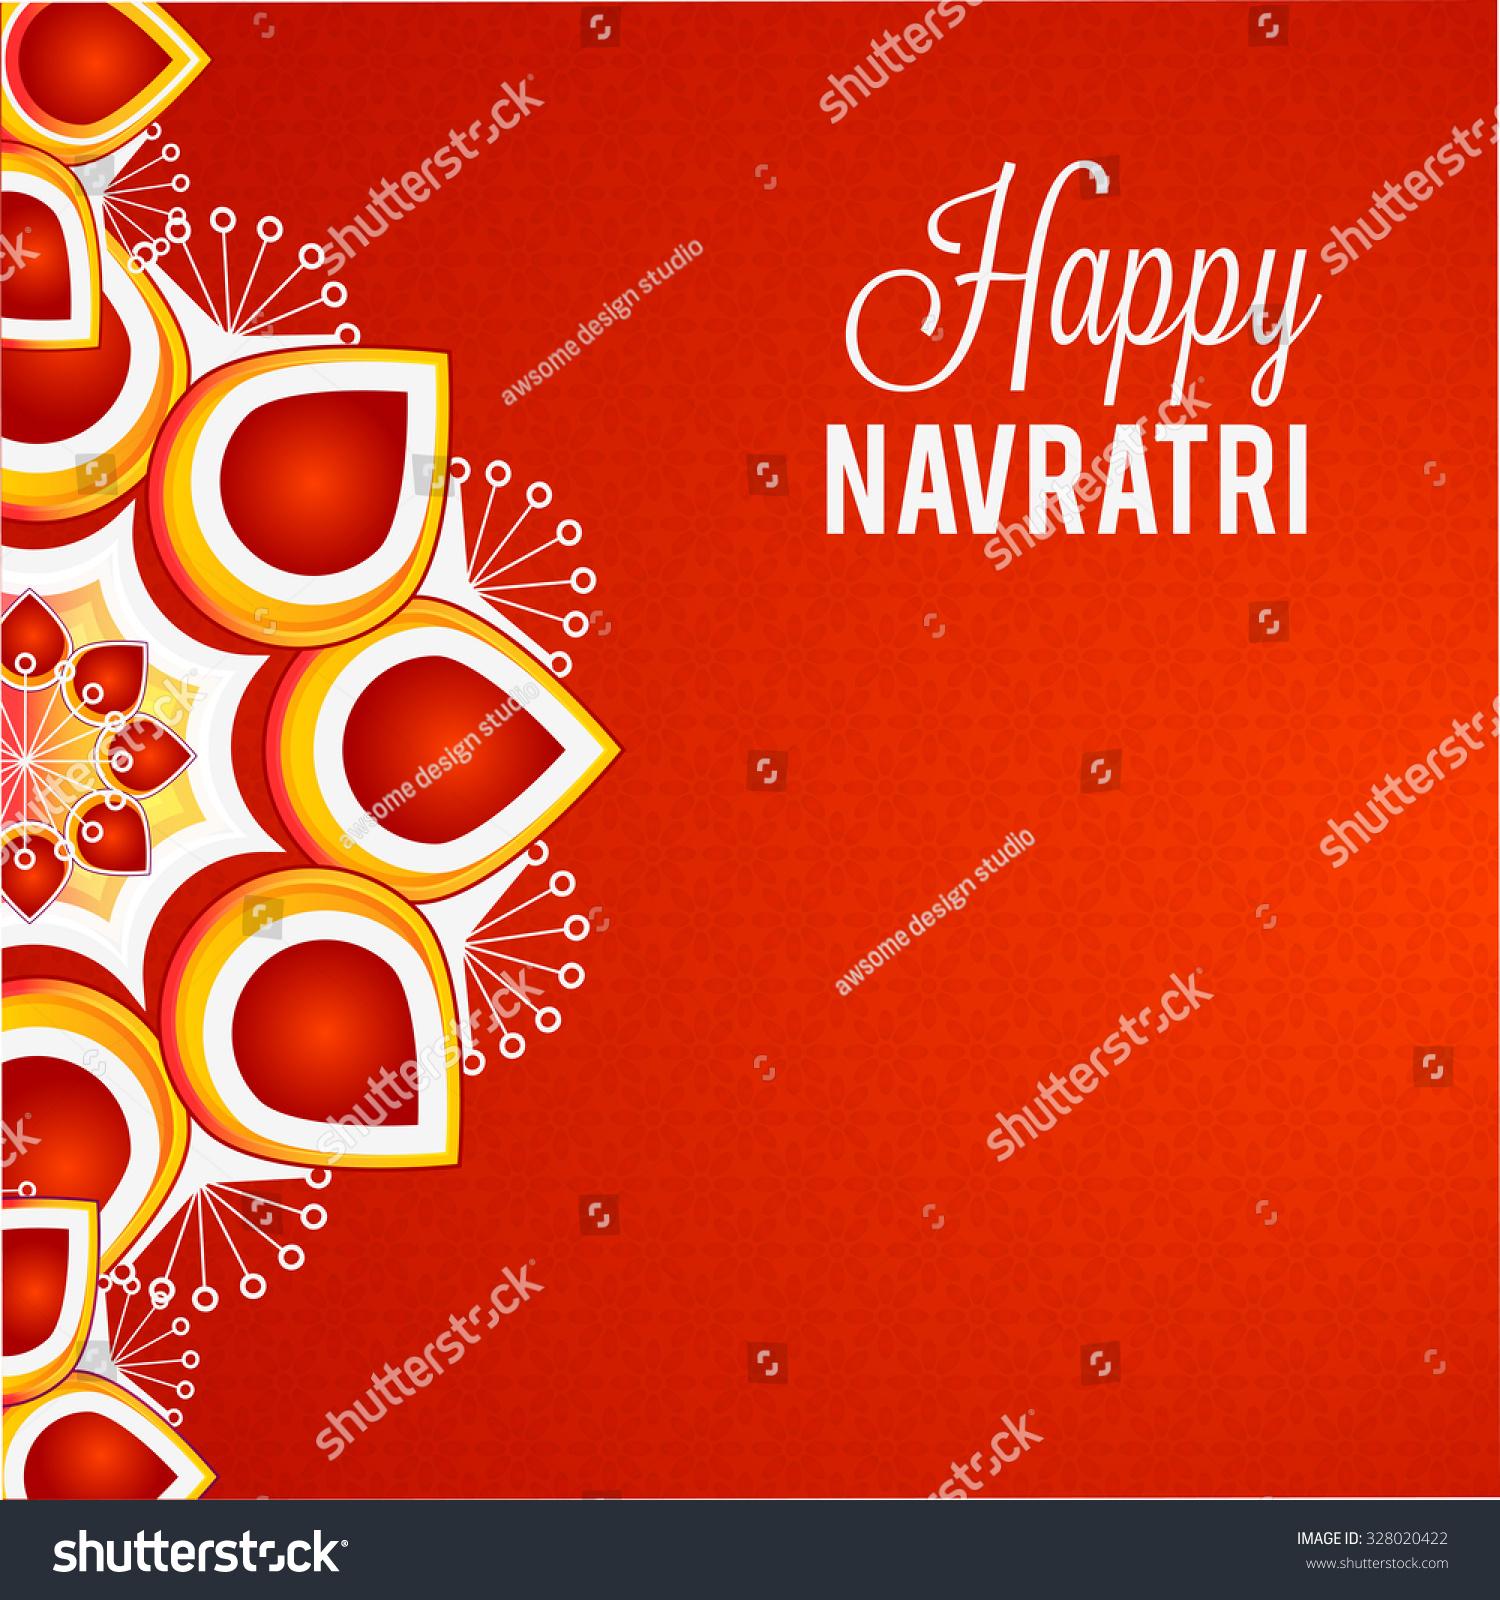 Vector illustration navratri happy diwali festival stock vector vector illustration navratri or happy diwali festival greeting card background kristyandbryce Choice Image